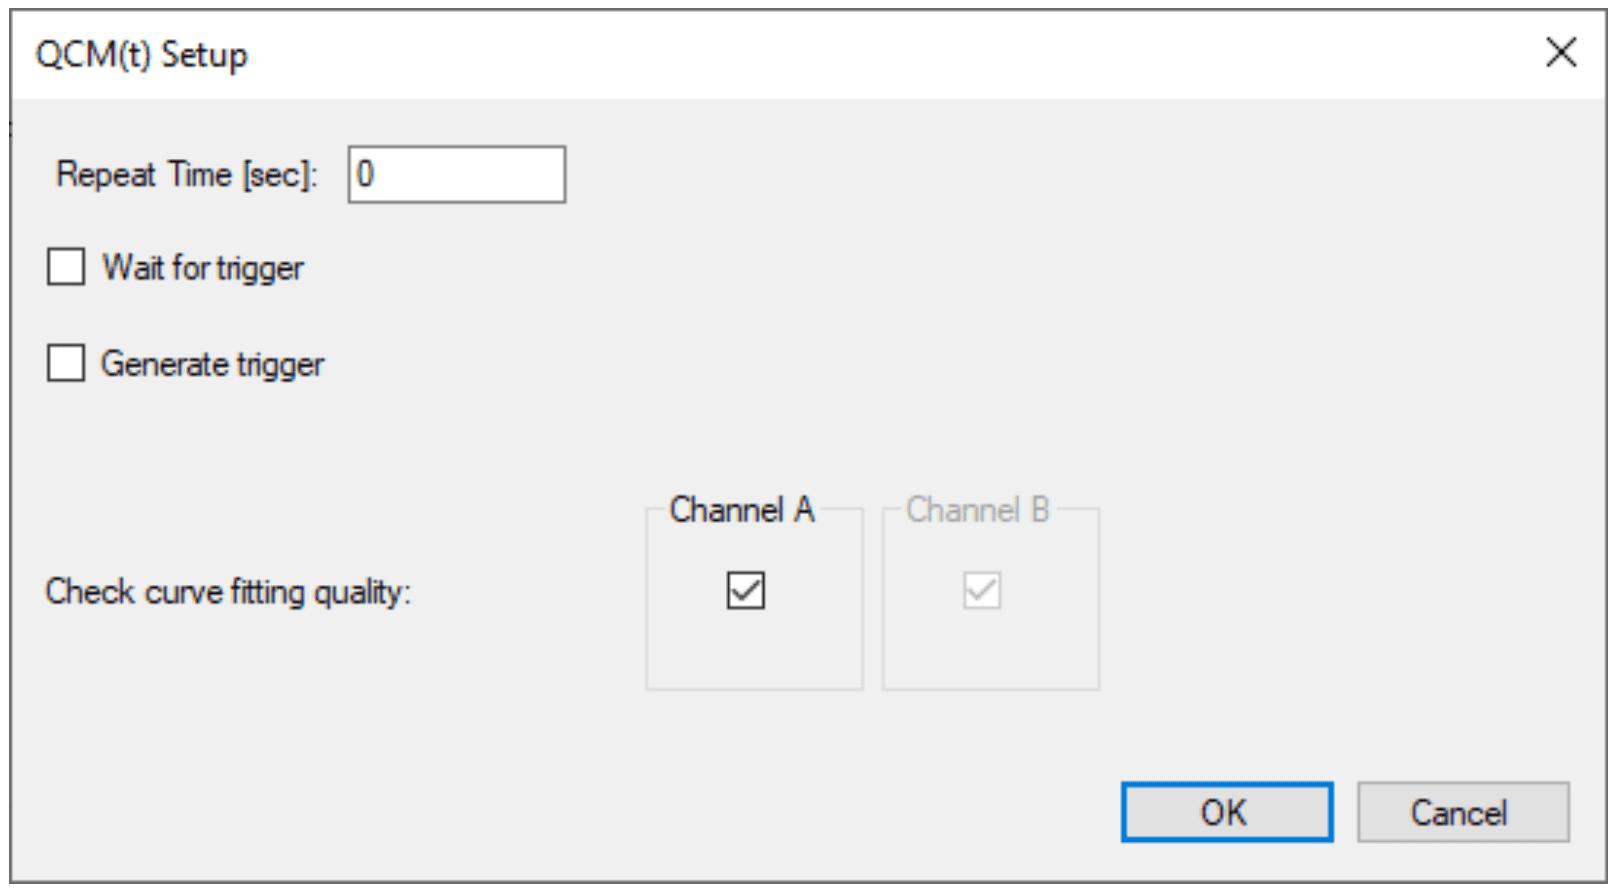 Synchronizing QCM-I (QCM-D) Measurements Using the Digital IO Port Figure 4